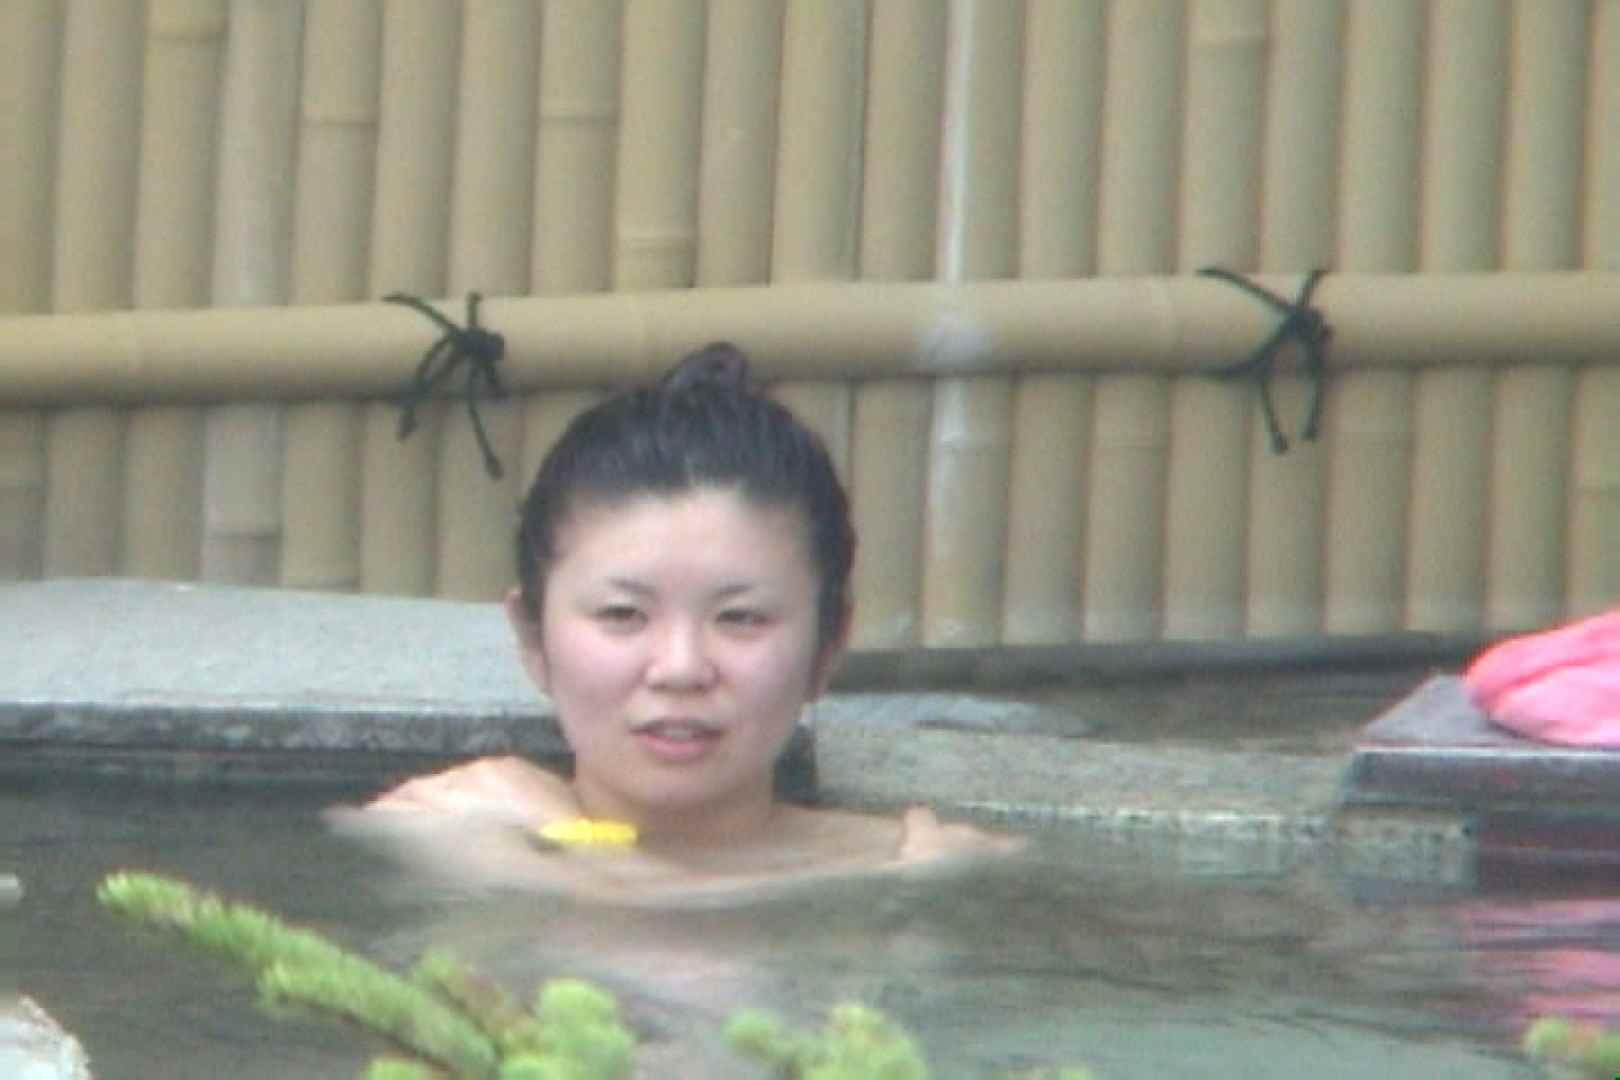 Aquaな露天風呂Vol.47【VIP限定】 露天風呂 隠し撮りオマンコ動画紹介 101連発 2